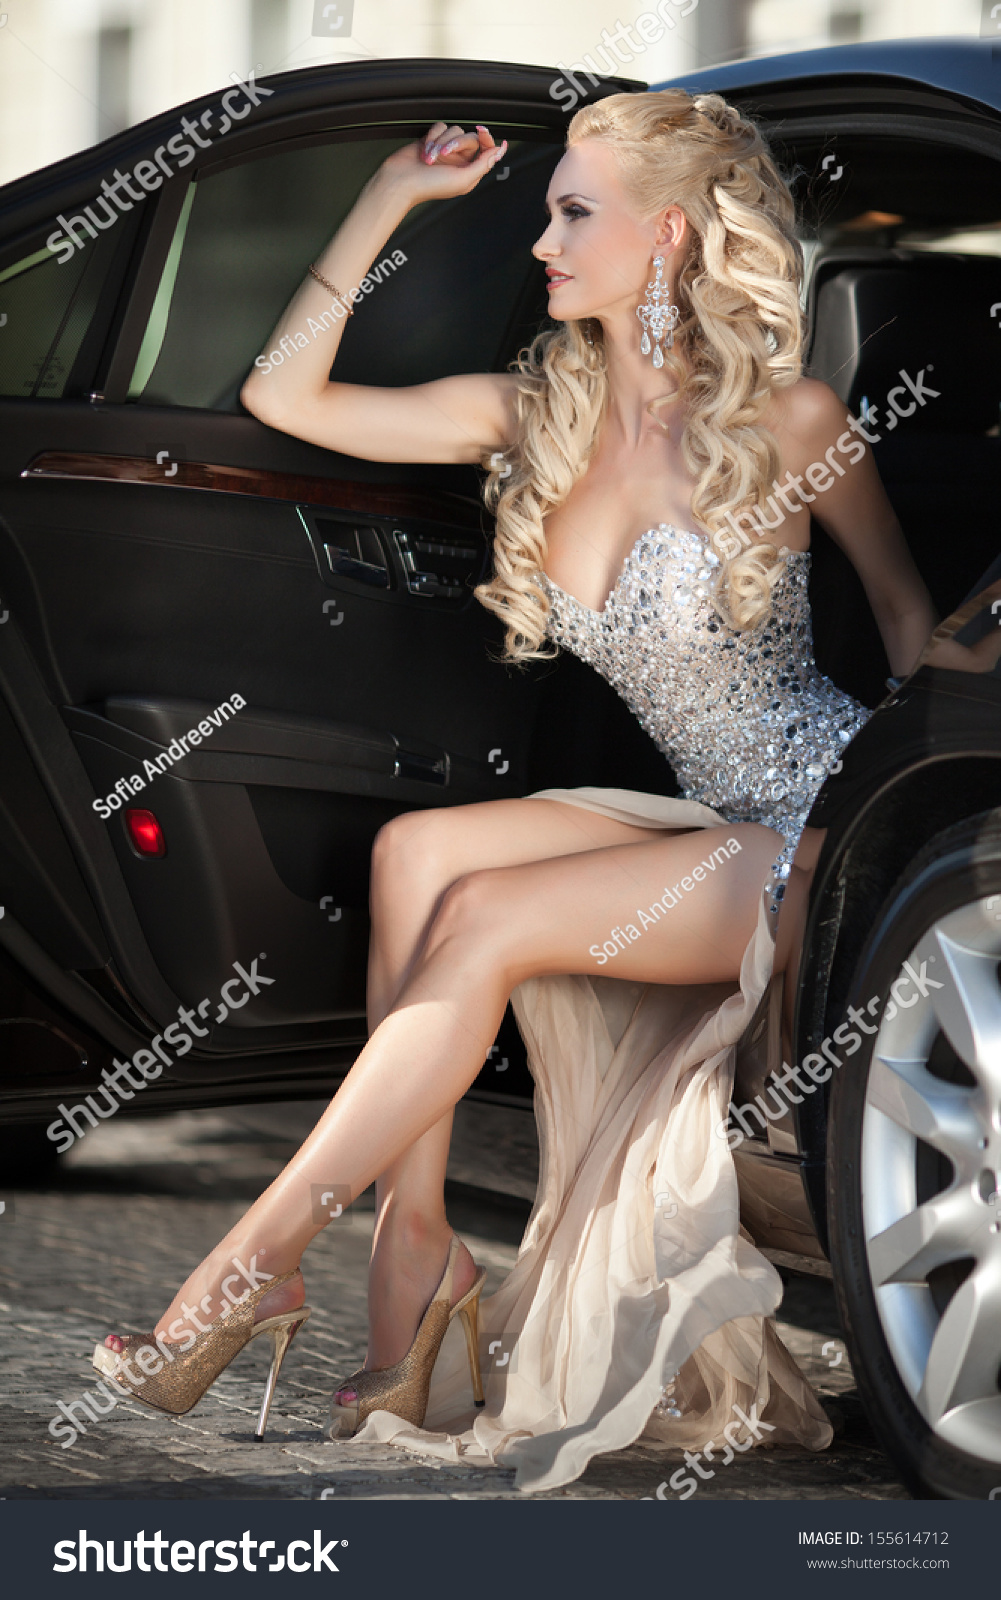 Free Wallpaper Cars And Beautiful Ladies Ferrari Beautiful Sexy Woman Luxury Car Long Stock Photo 155614712